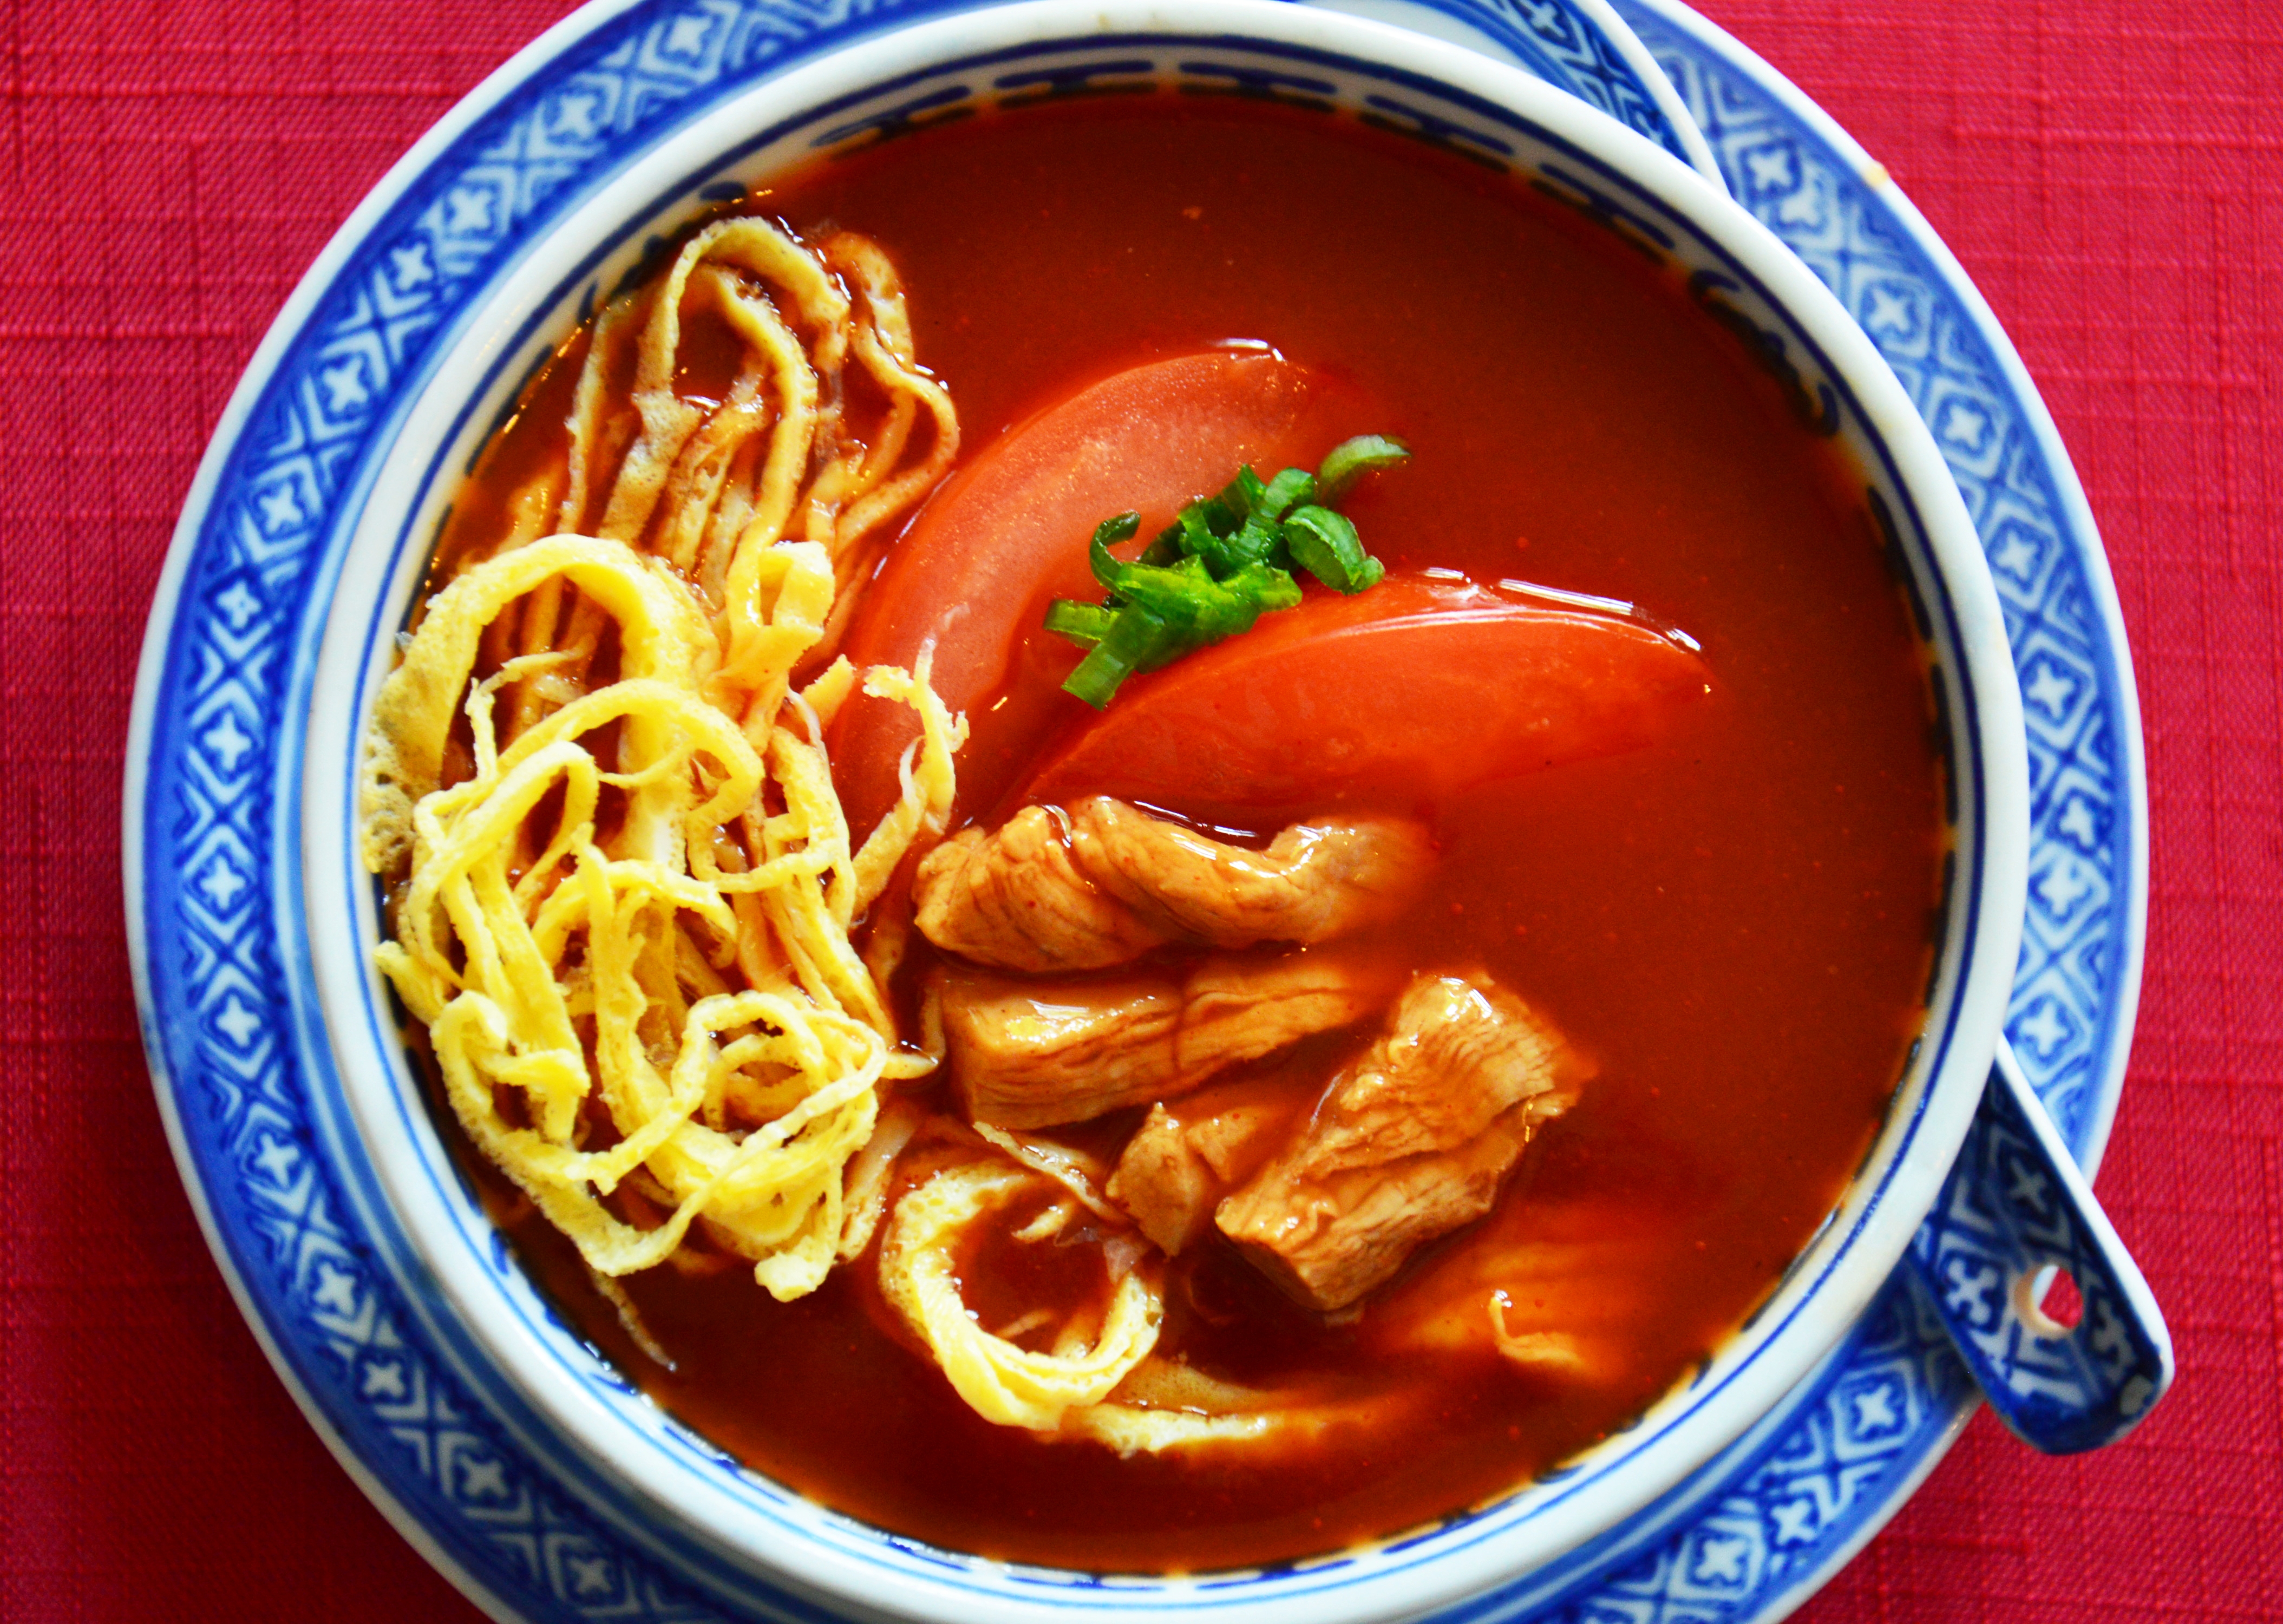 Zupy Kuchnia Chinska Menu Restauracja Zlota Kaczka